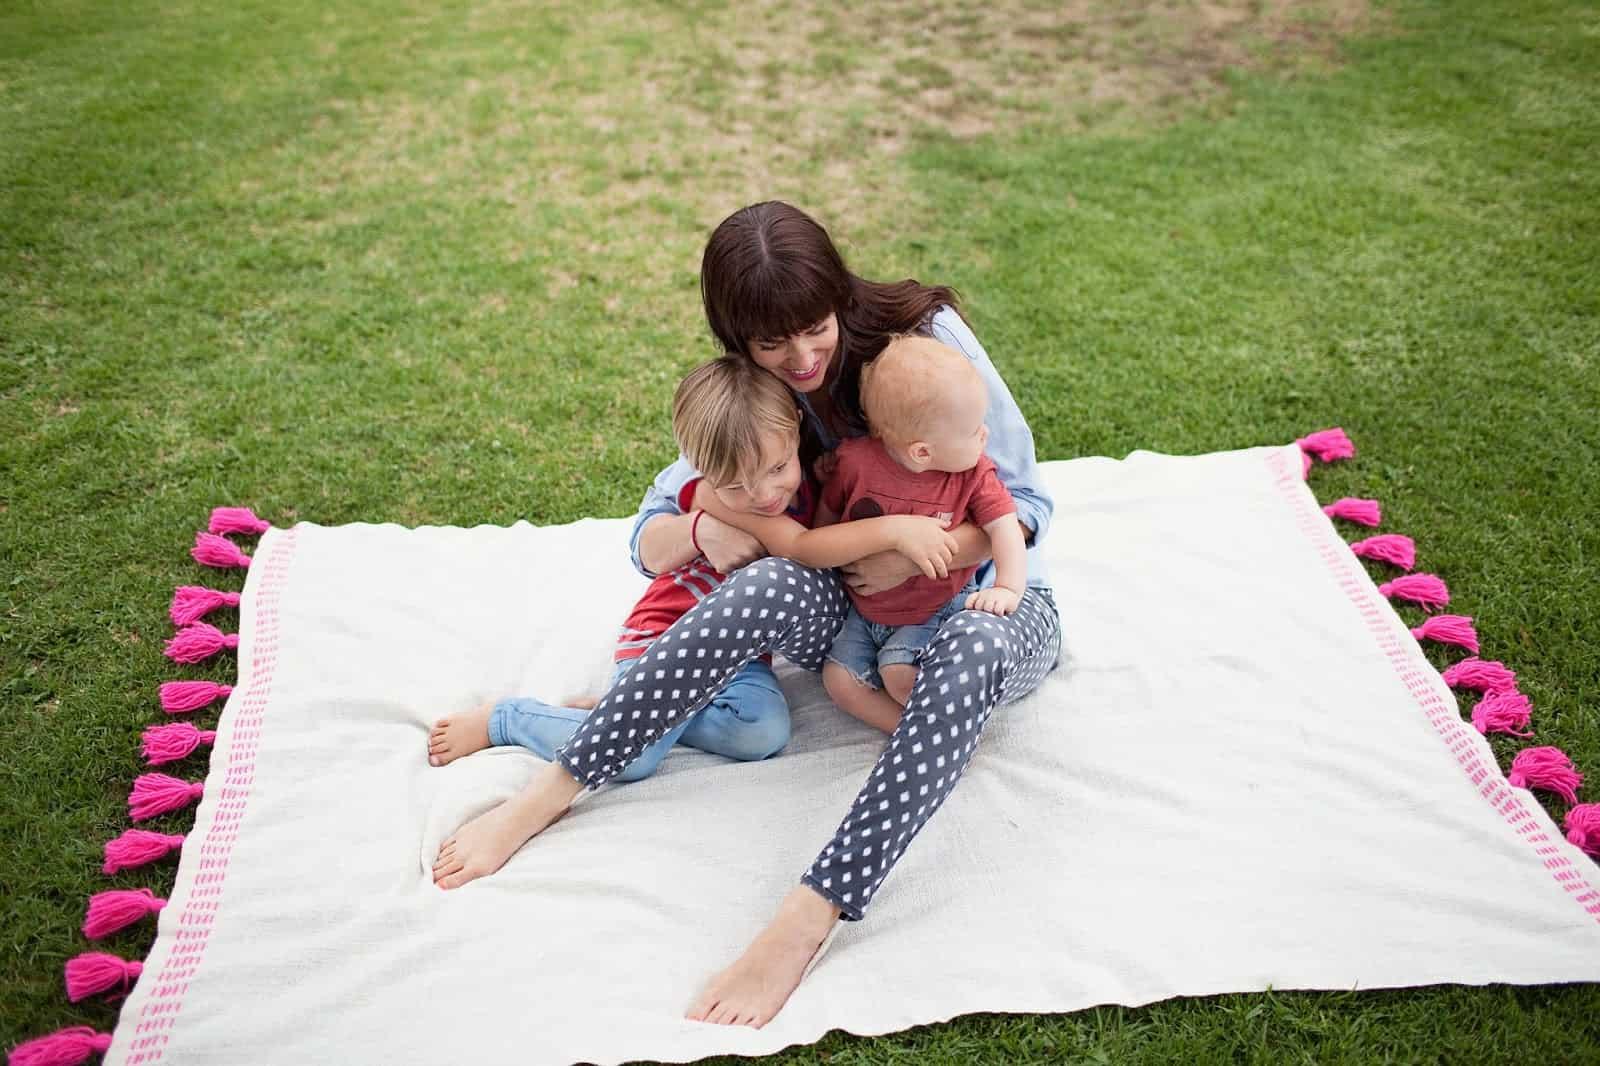 Tassel picnic blanket